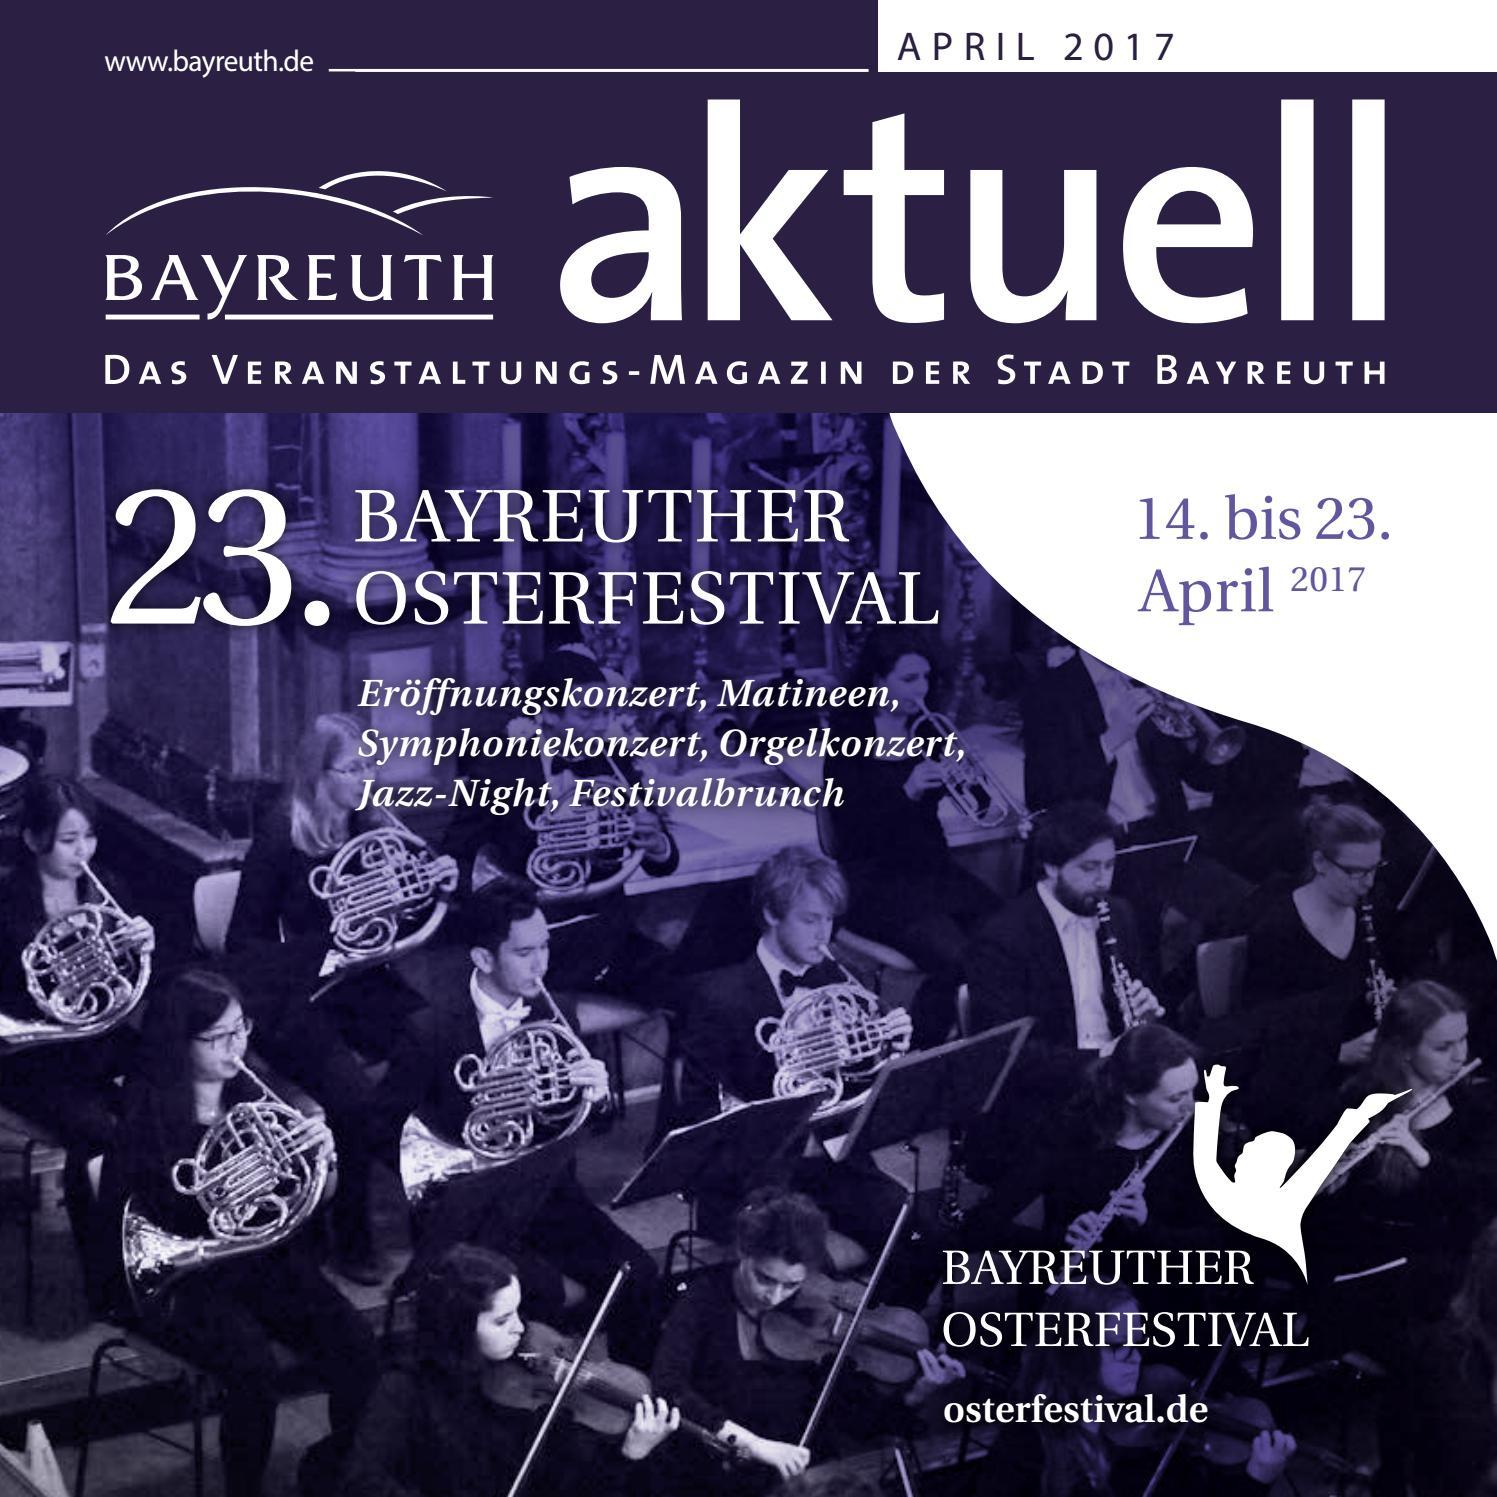 Bayreuth Aktuell April 2017 by Bayreuther Sonntagszeitung issuu